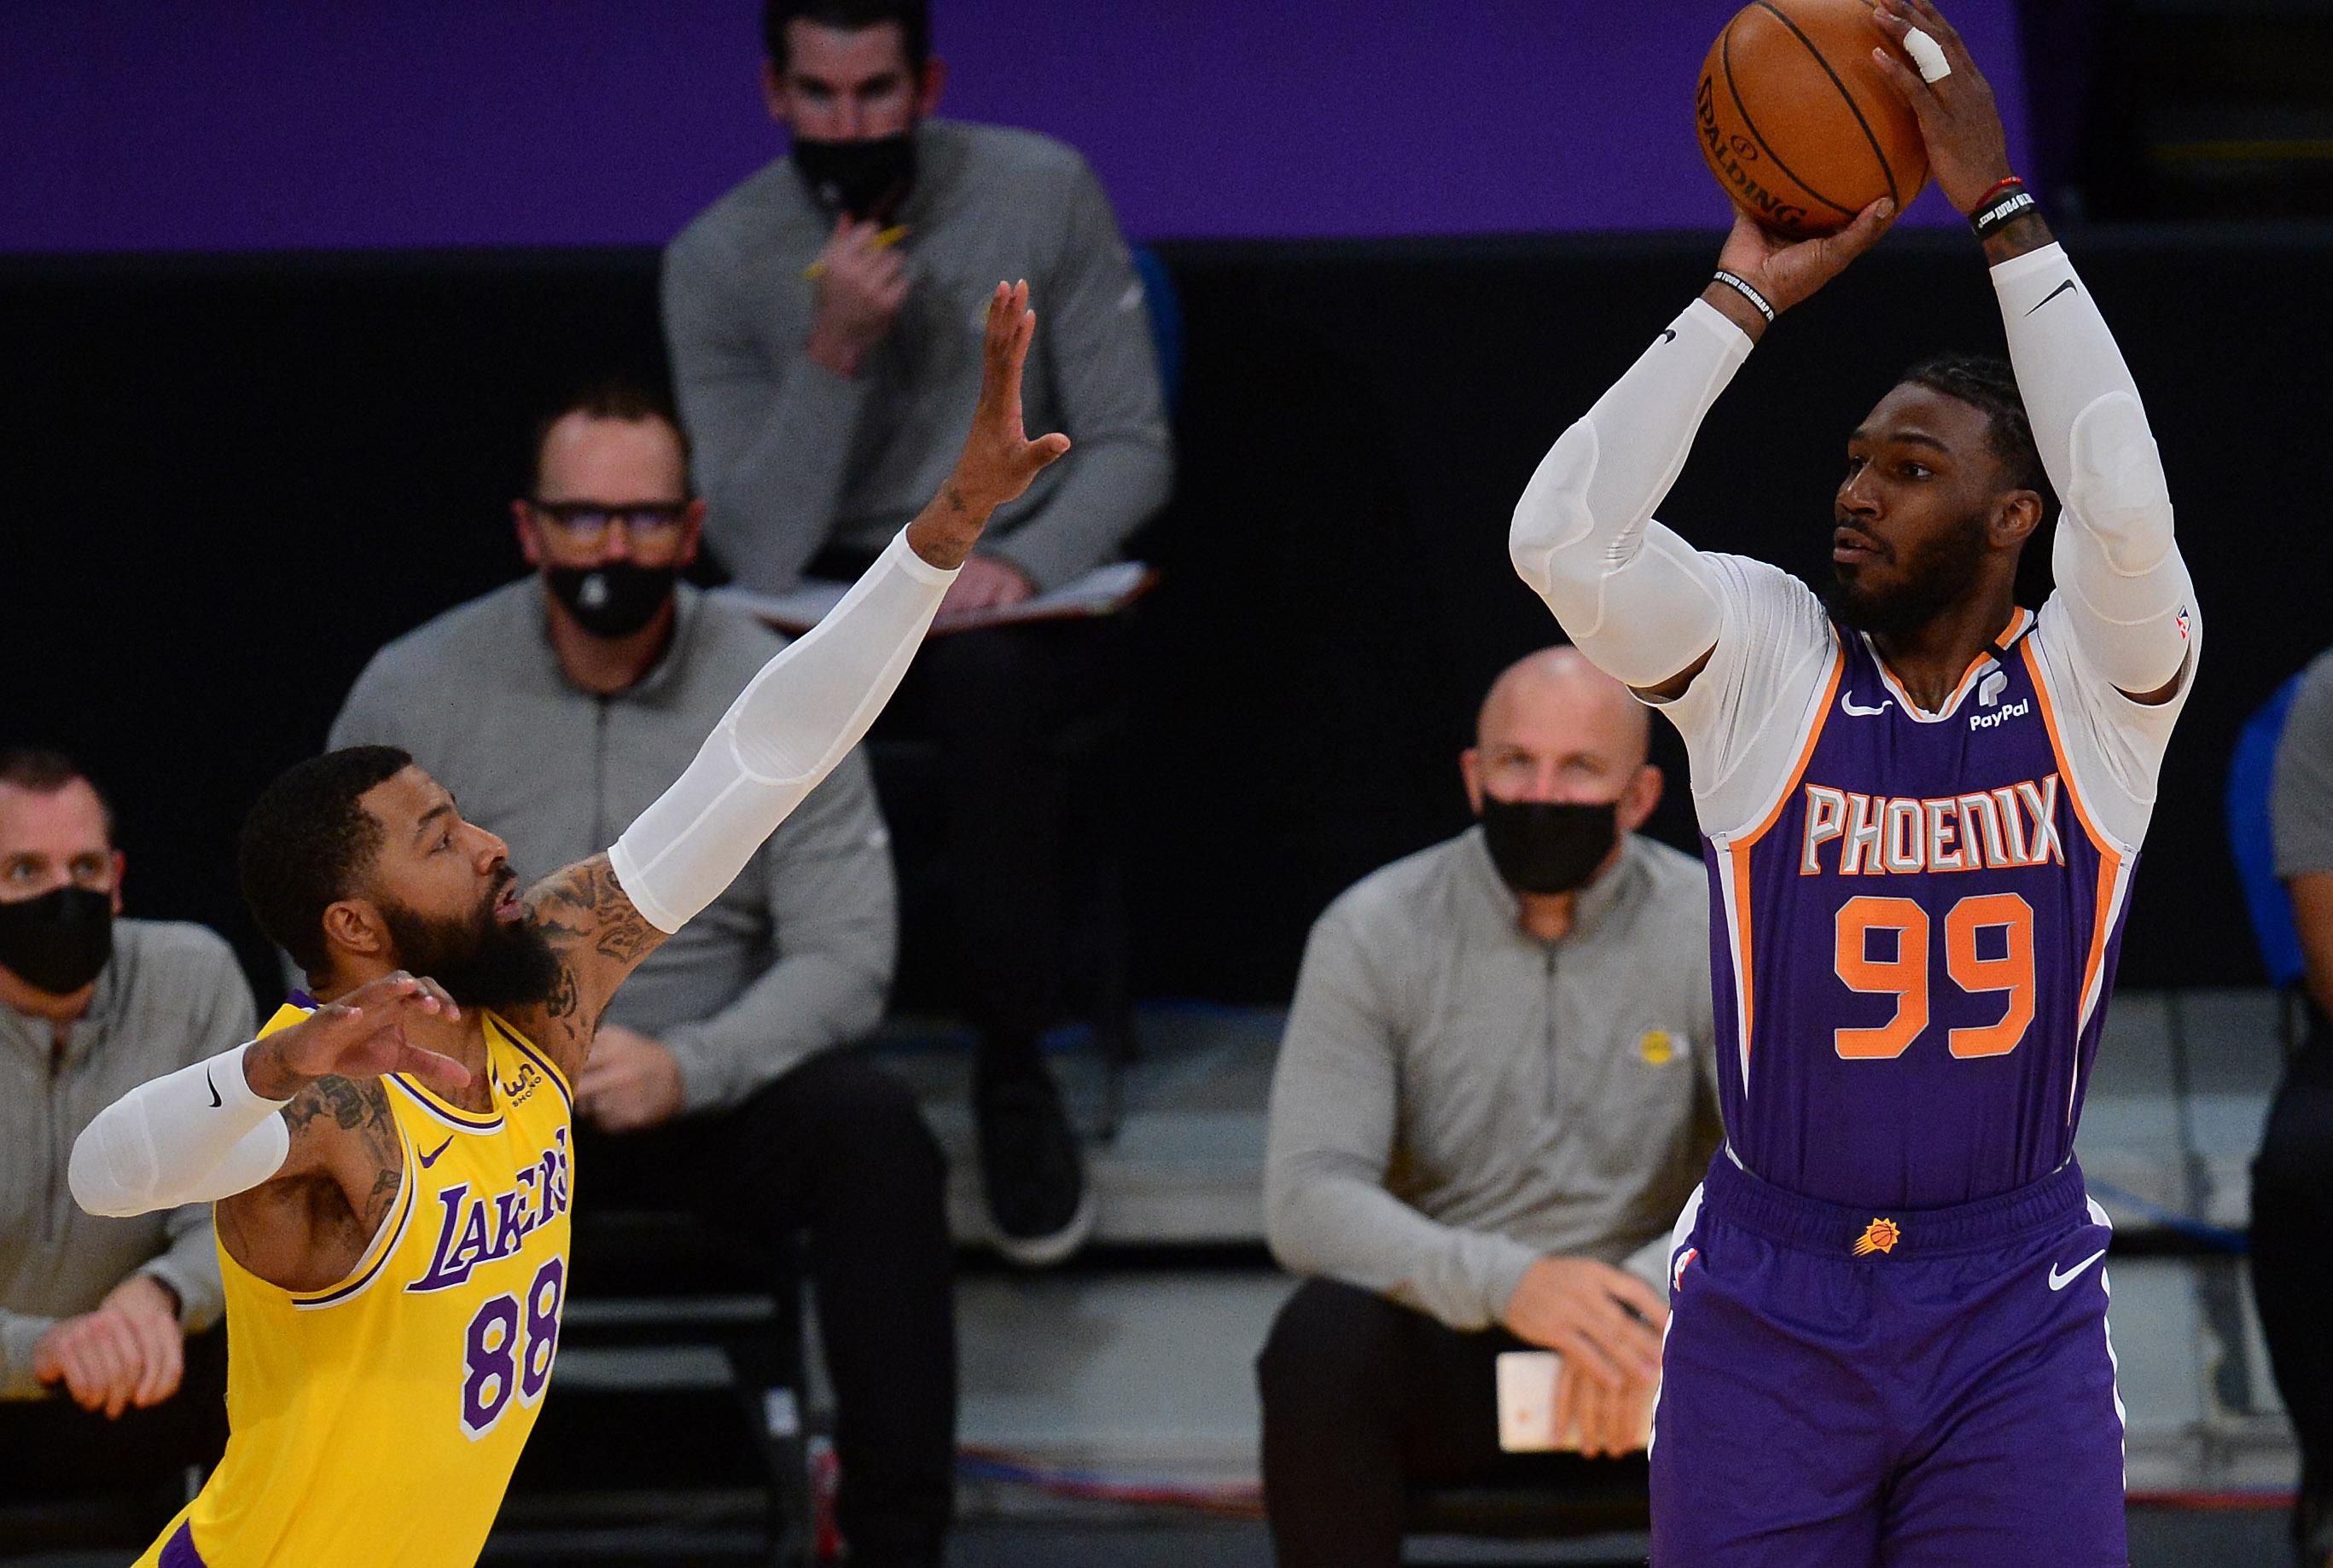 Jae Crowder, Phoenix Suns